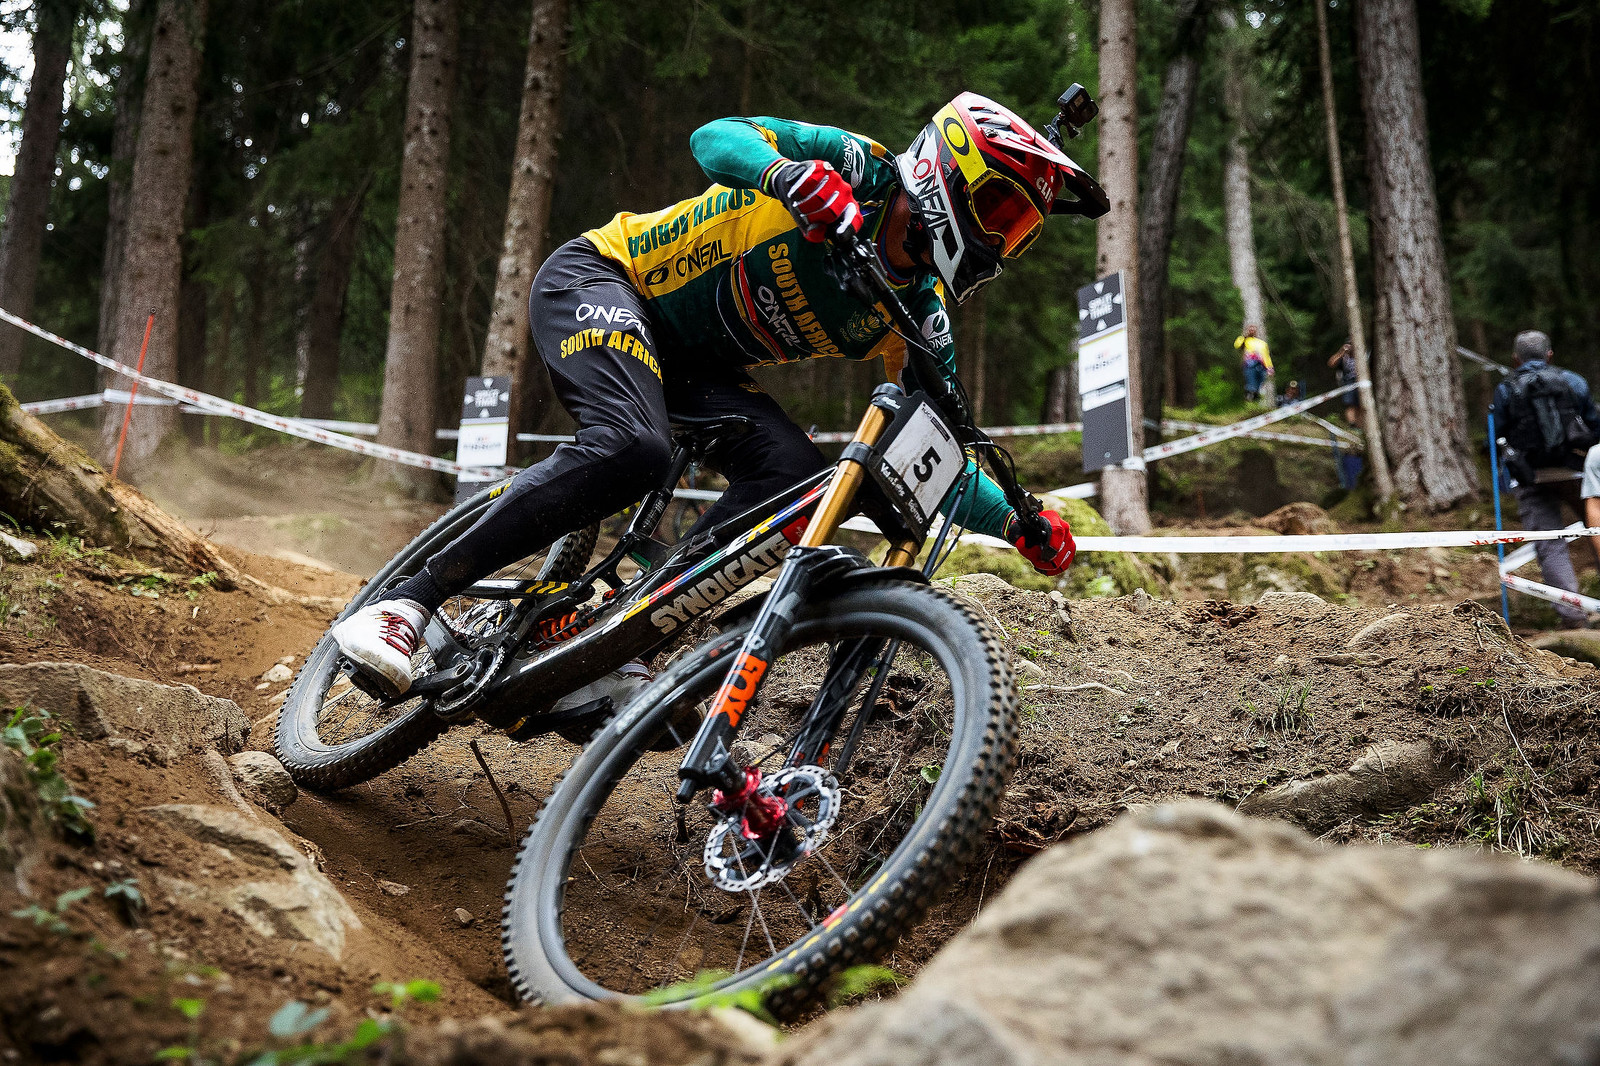 2021 UCI Mountain Bike Downhill World Champion, Greg Minnaar